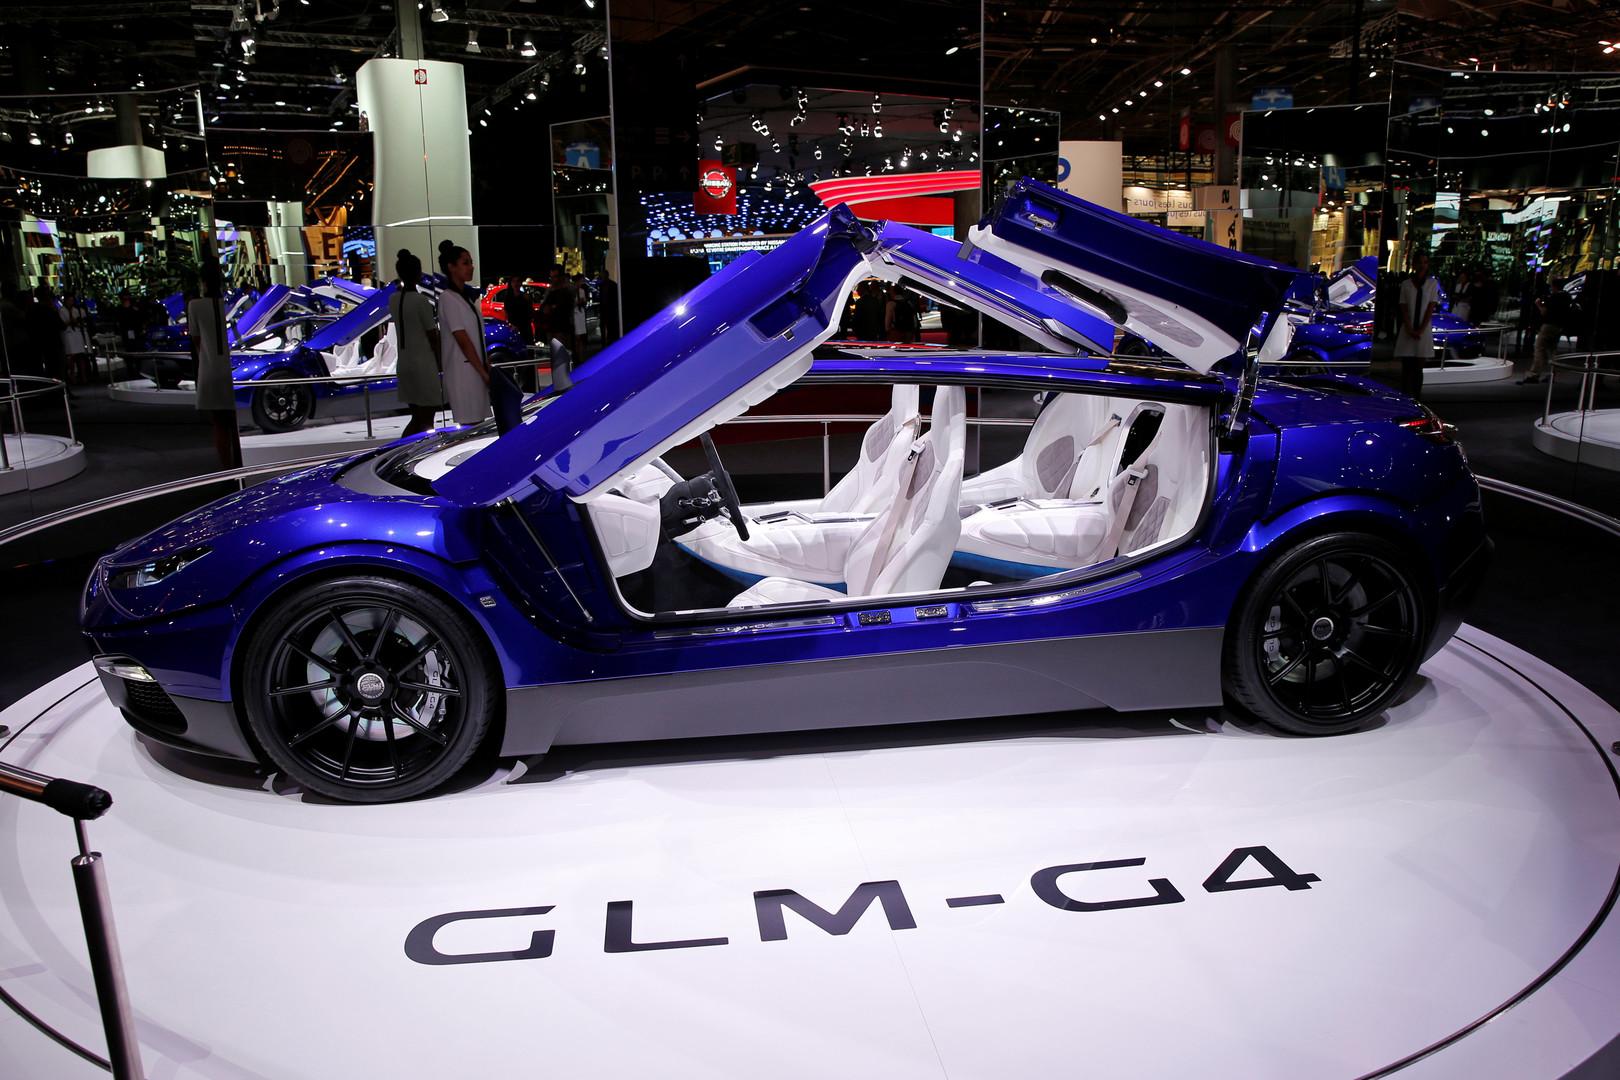 Roadyacht GLM-G4